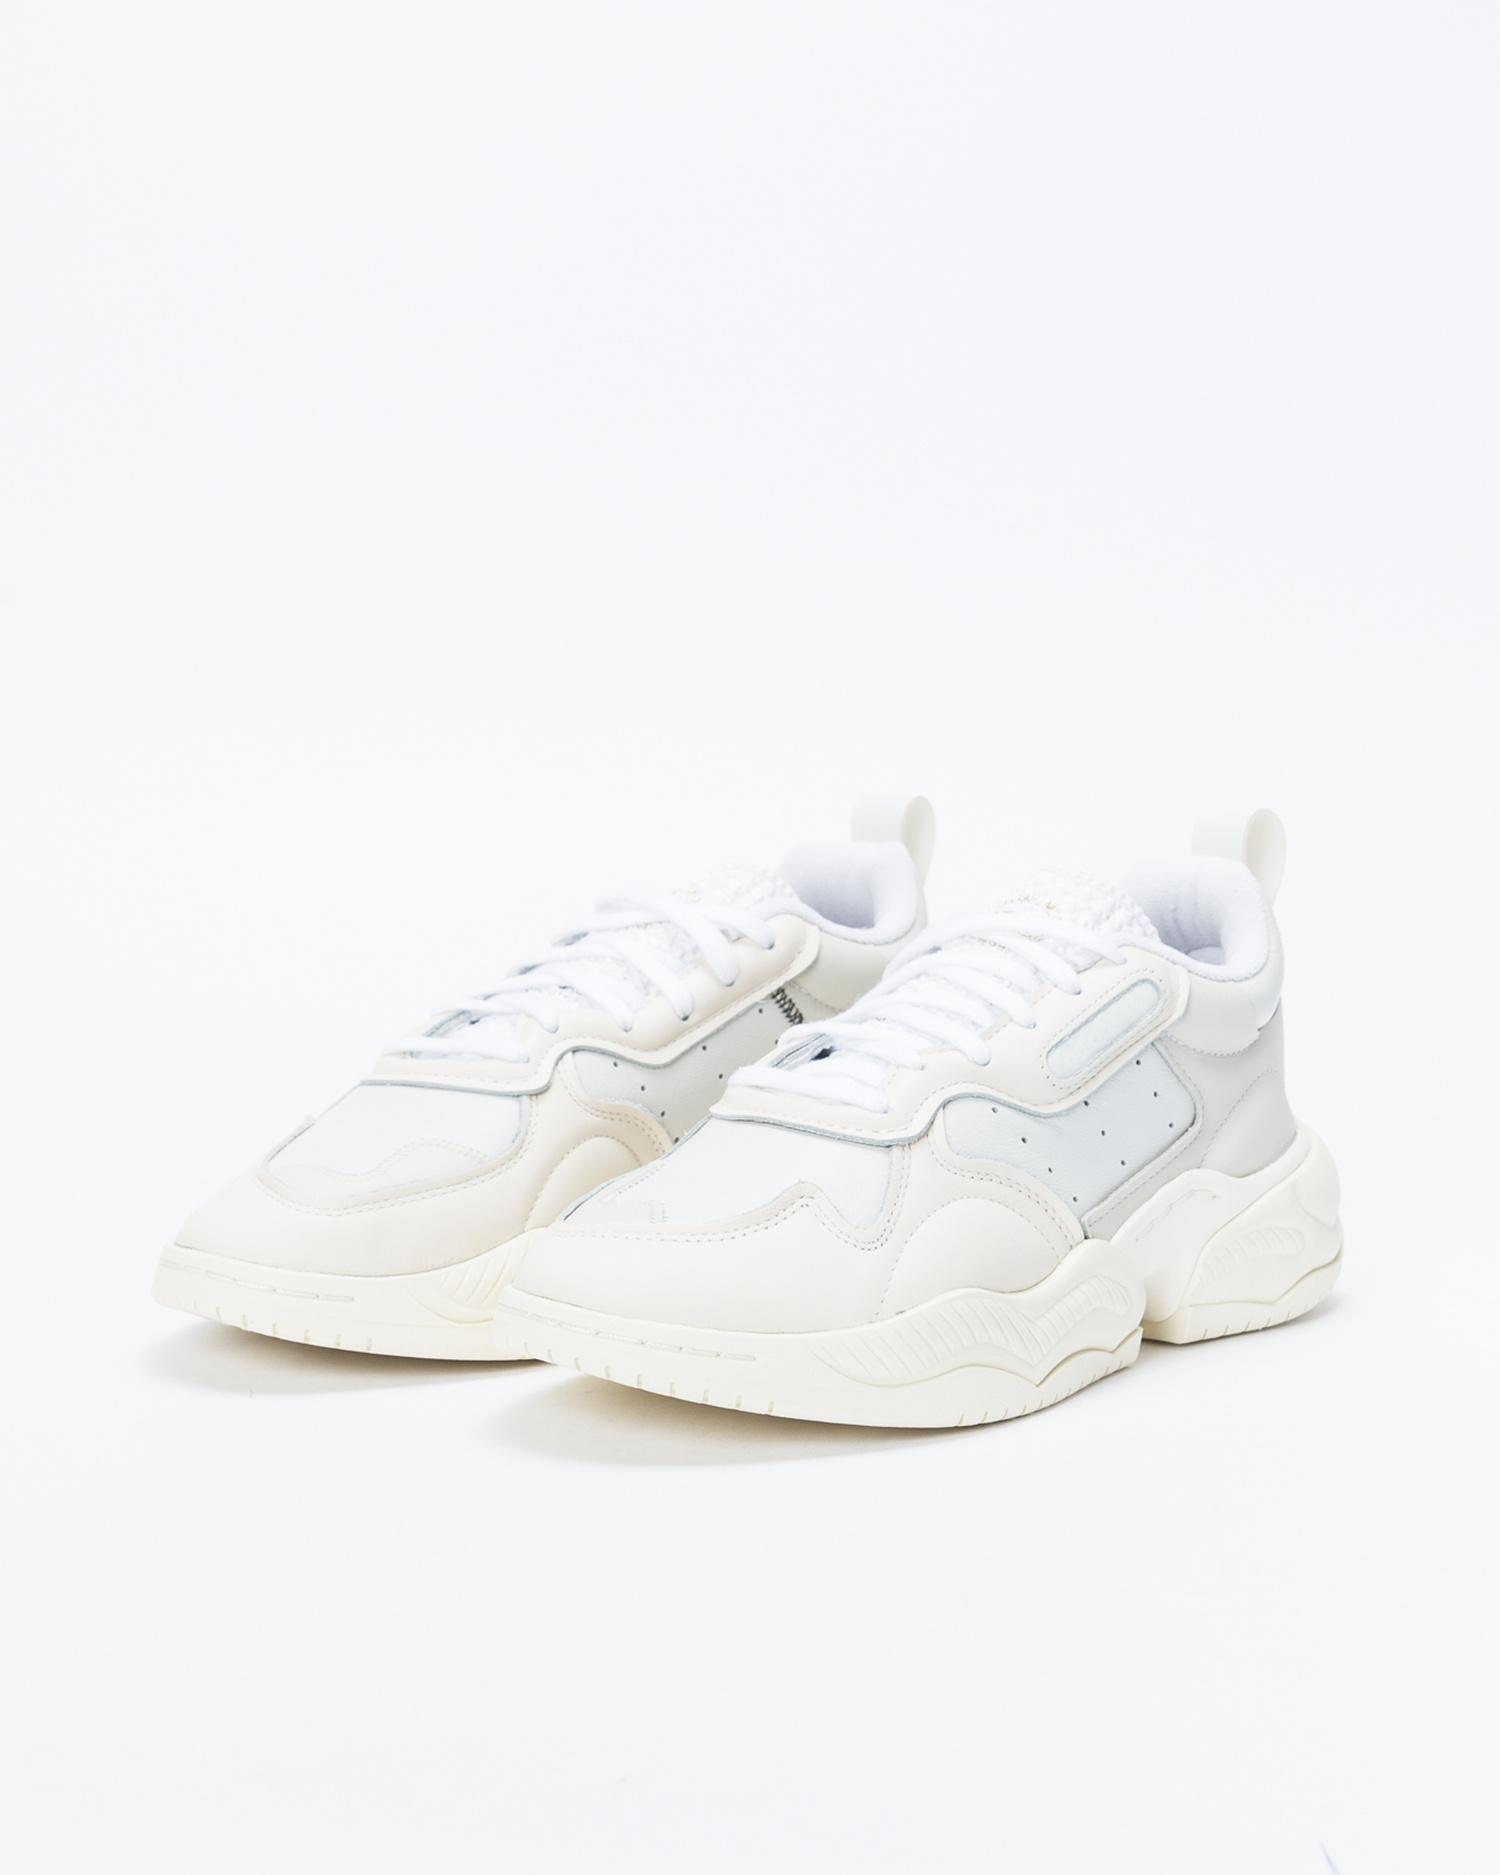 Adidas Supercourt RX  ftwwht/ftwwht/owhite